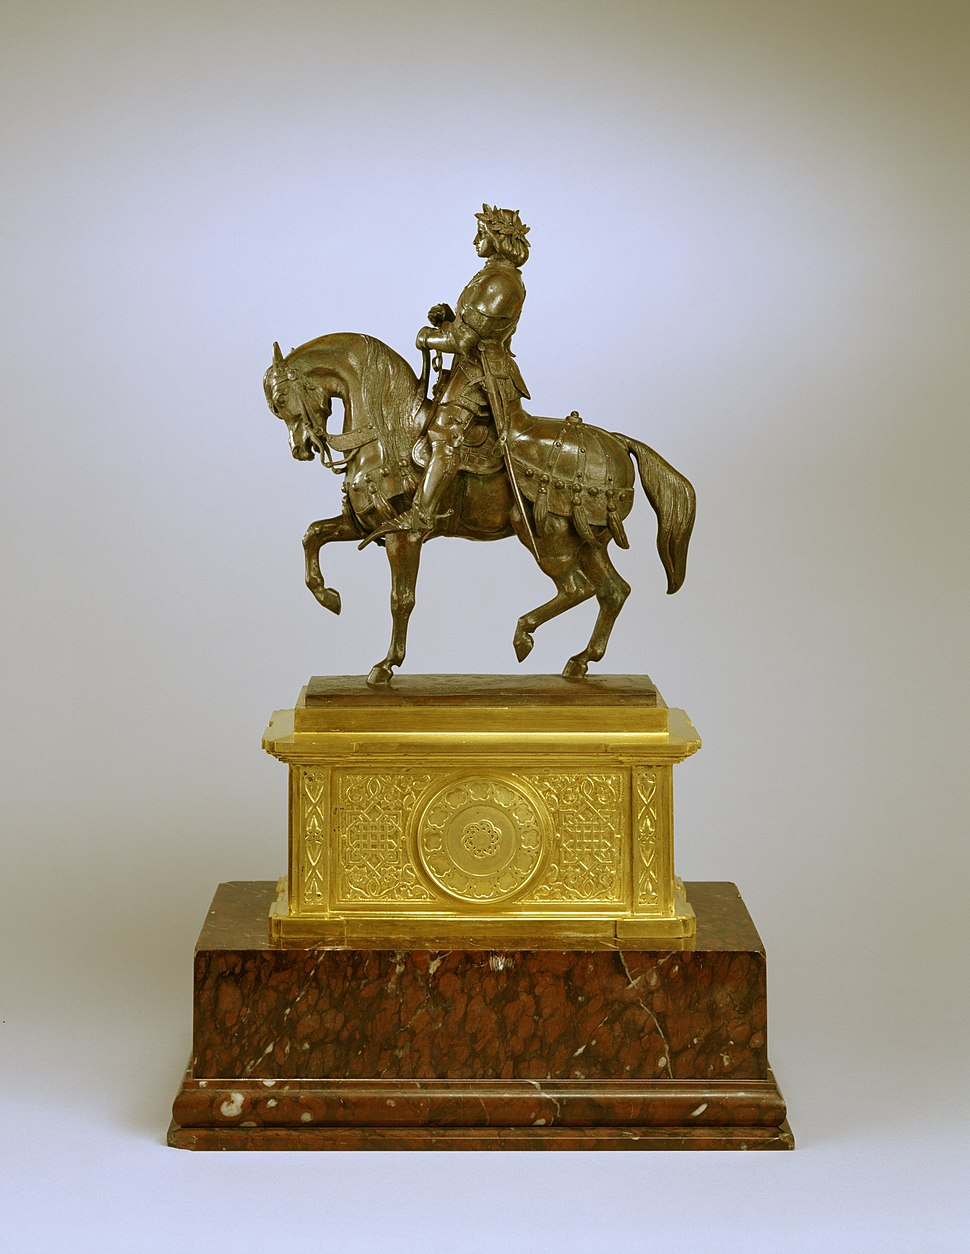 Antoine-Louis Barye - Charles VII, the Victorious - Walters 27164 - Profile